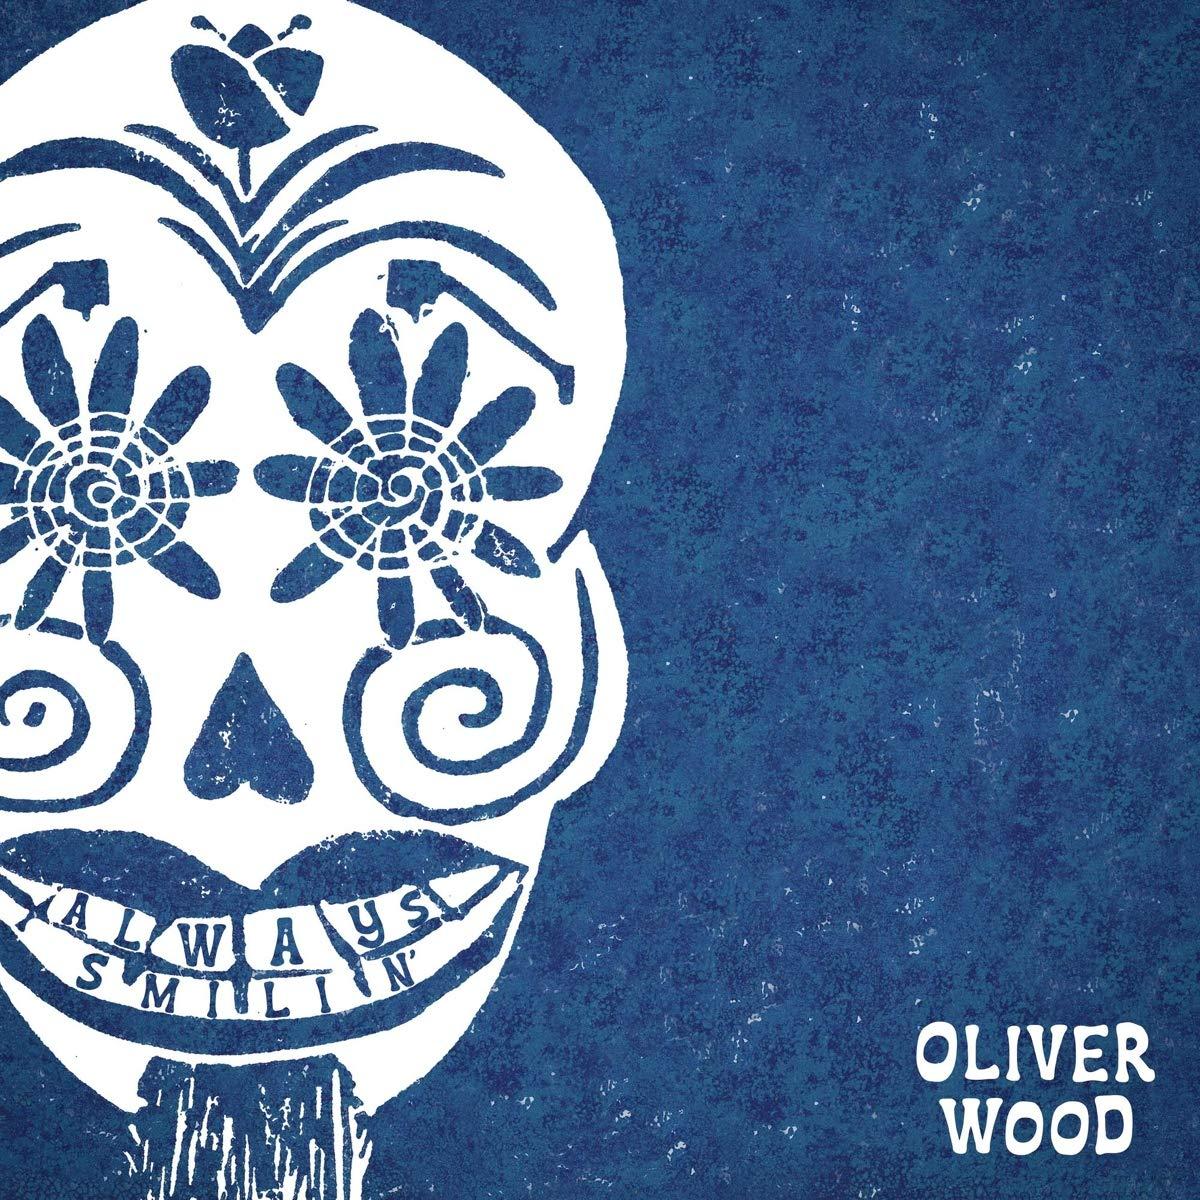 Oliver Wood – Always Smilin' (2021) [FLAC]